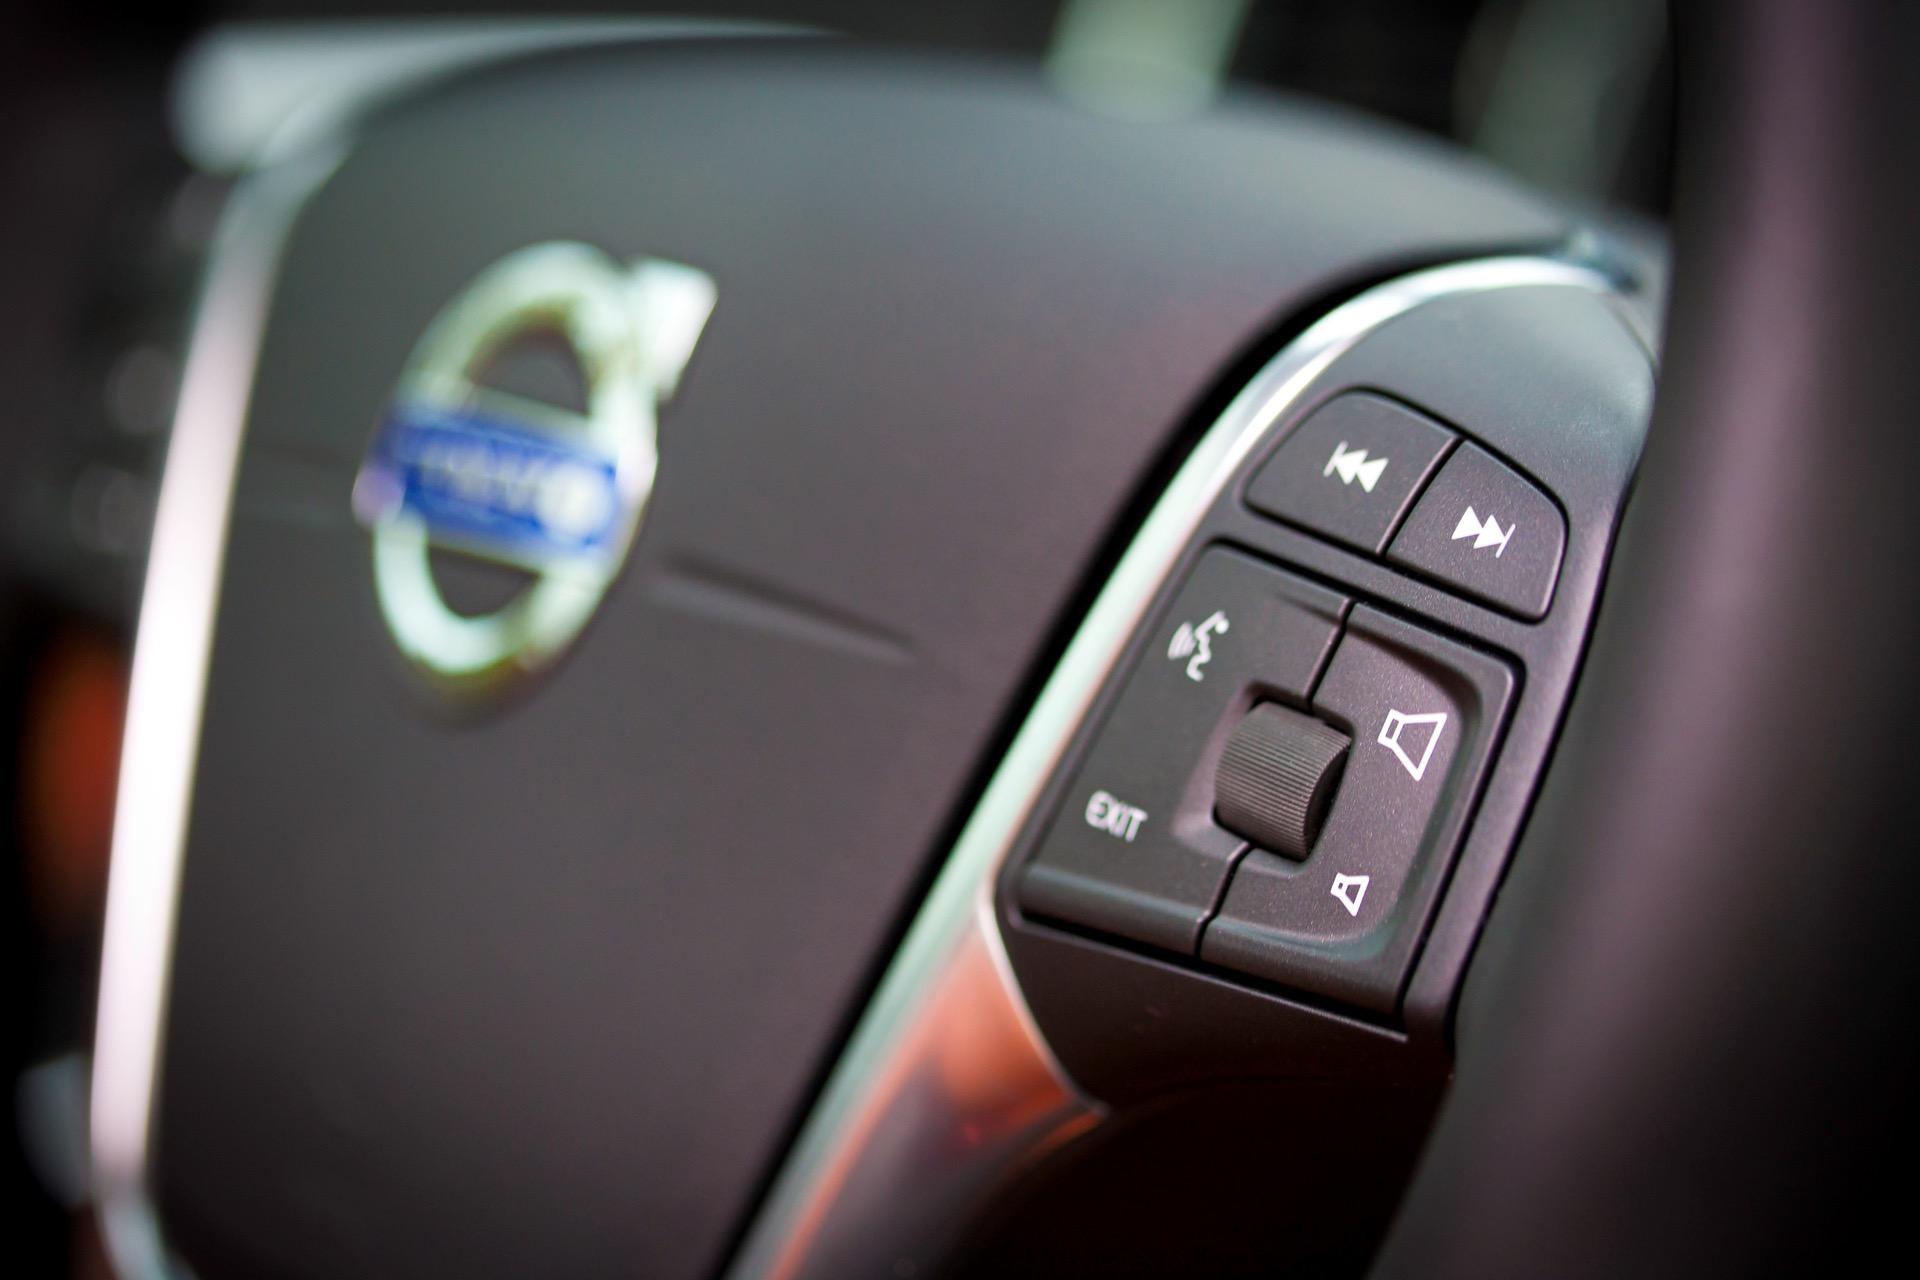 S60 T6 Awd Sport Steering Wheel -  Volvo